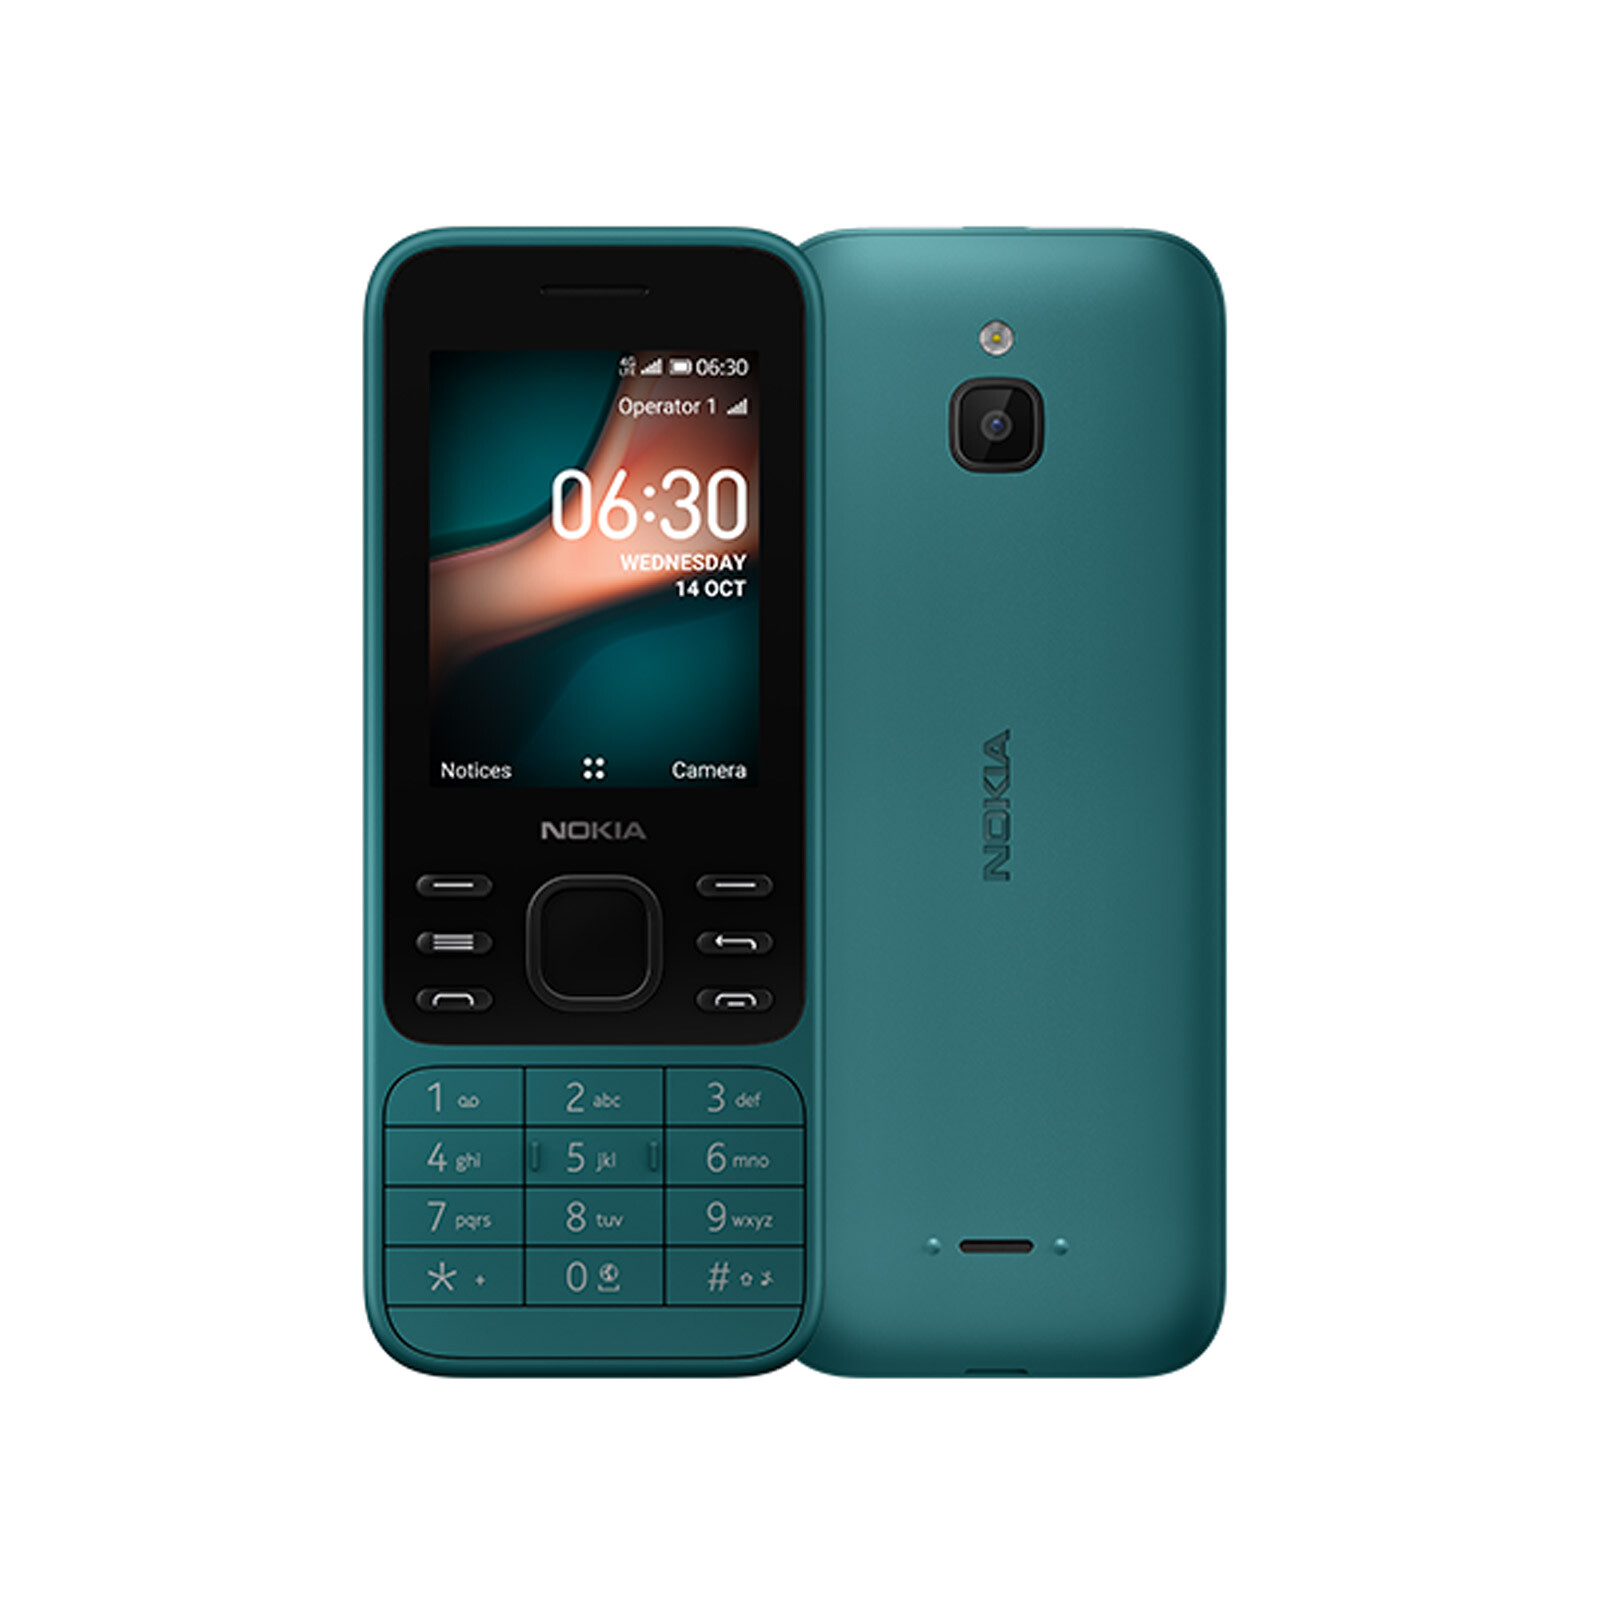 Nokia 6300 4G blau Dual-SIM